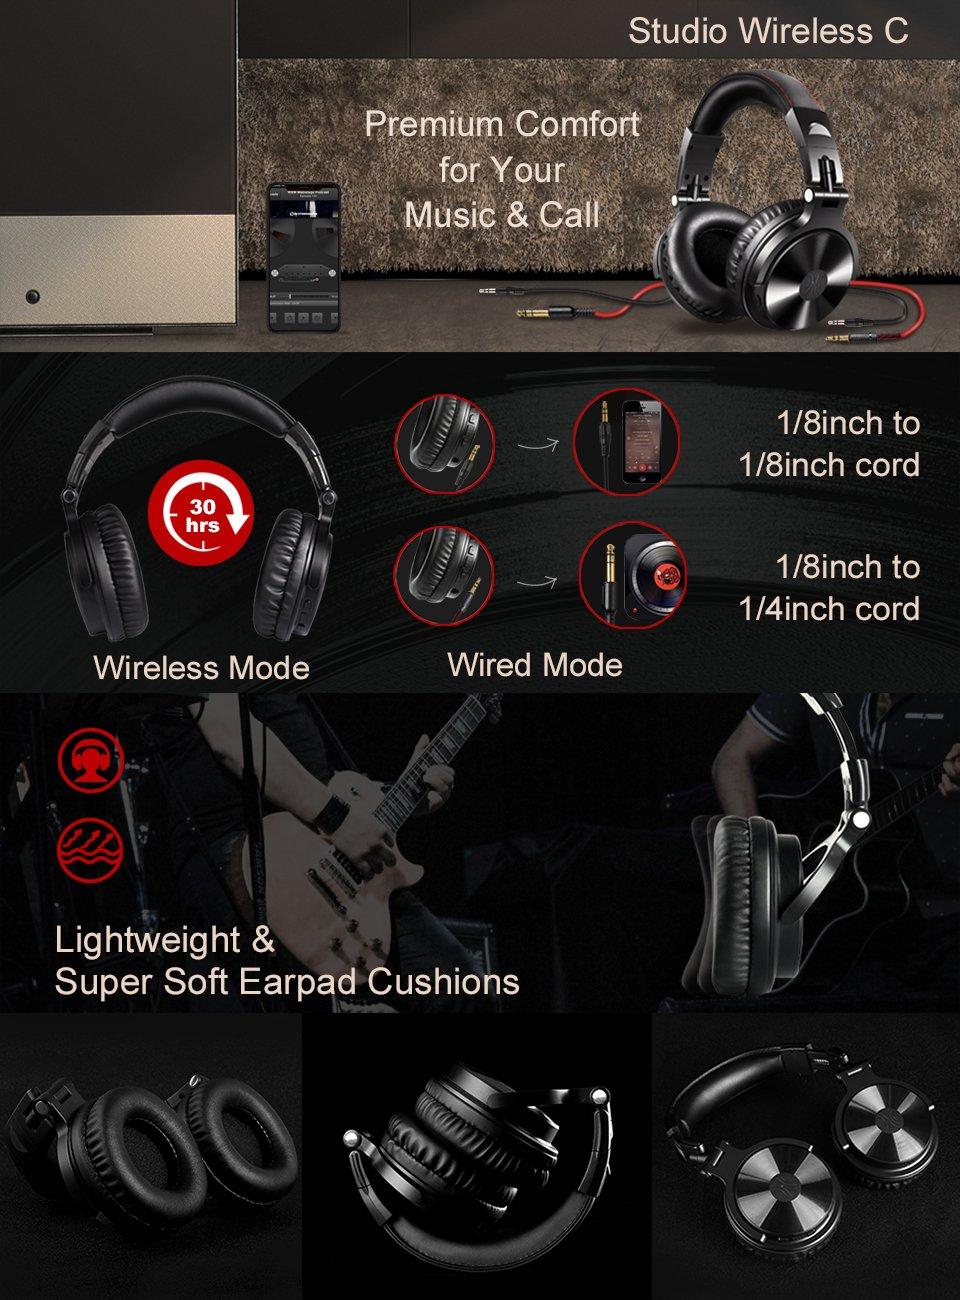 Wireless/Wired Over Ear Headsets, 30 Hrs Studio Bluetooth Headphones $24.99 (reg. $39.99)